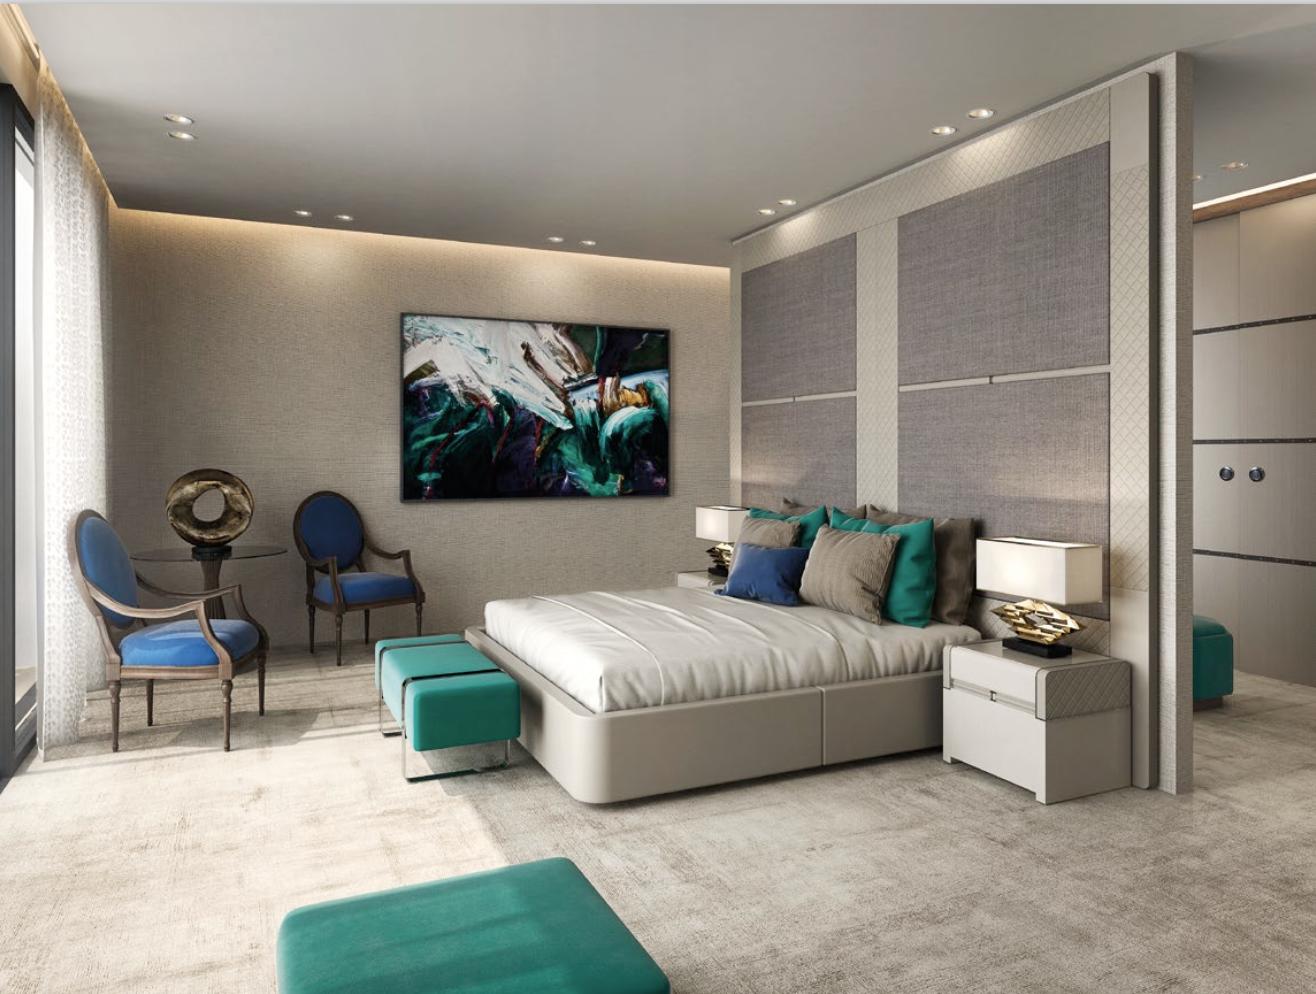 Interiorismo-Dormitorio-Cityliving-David-Long-Designs